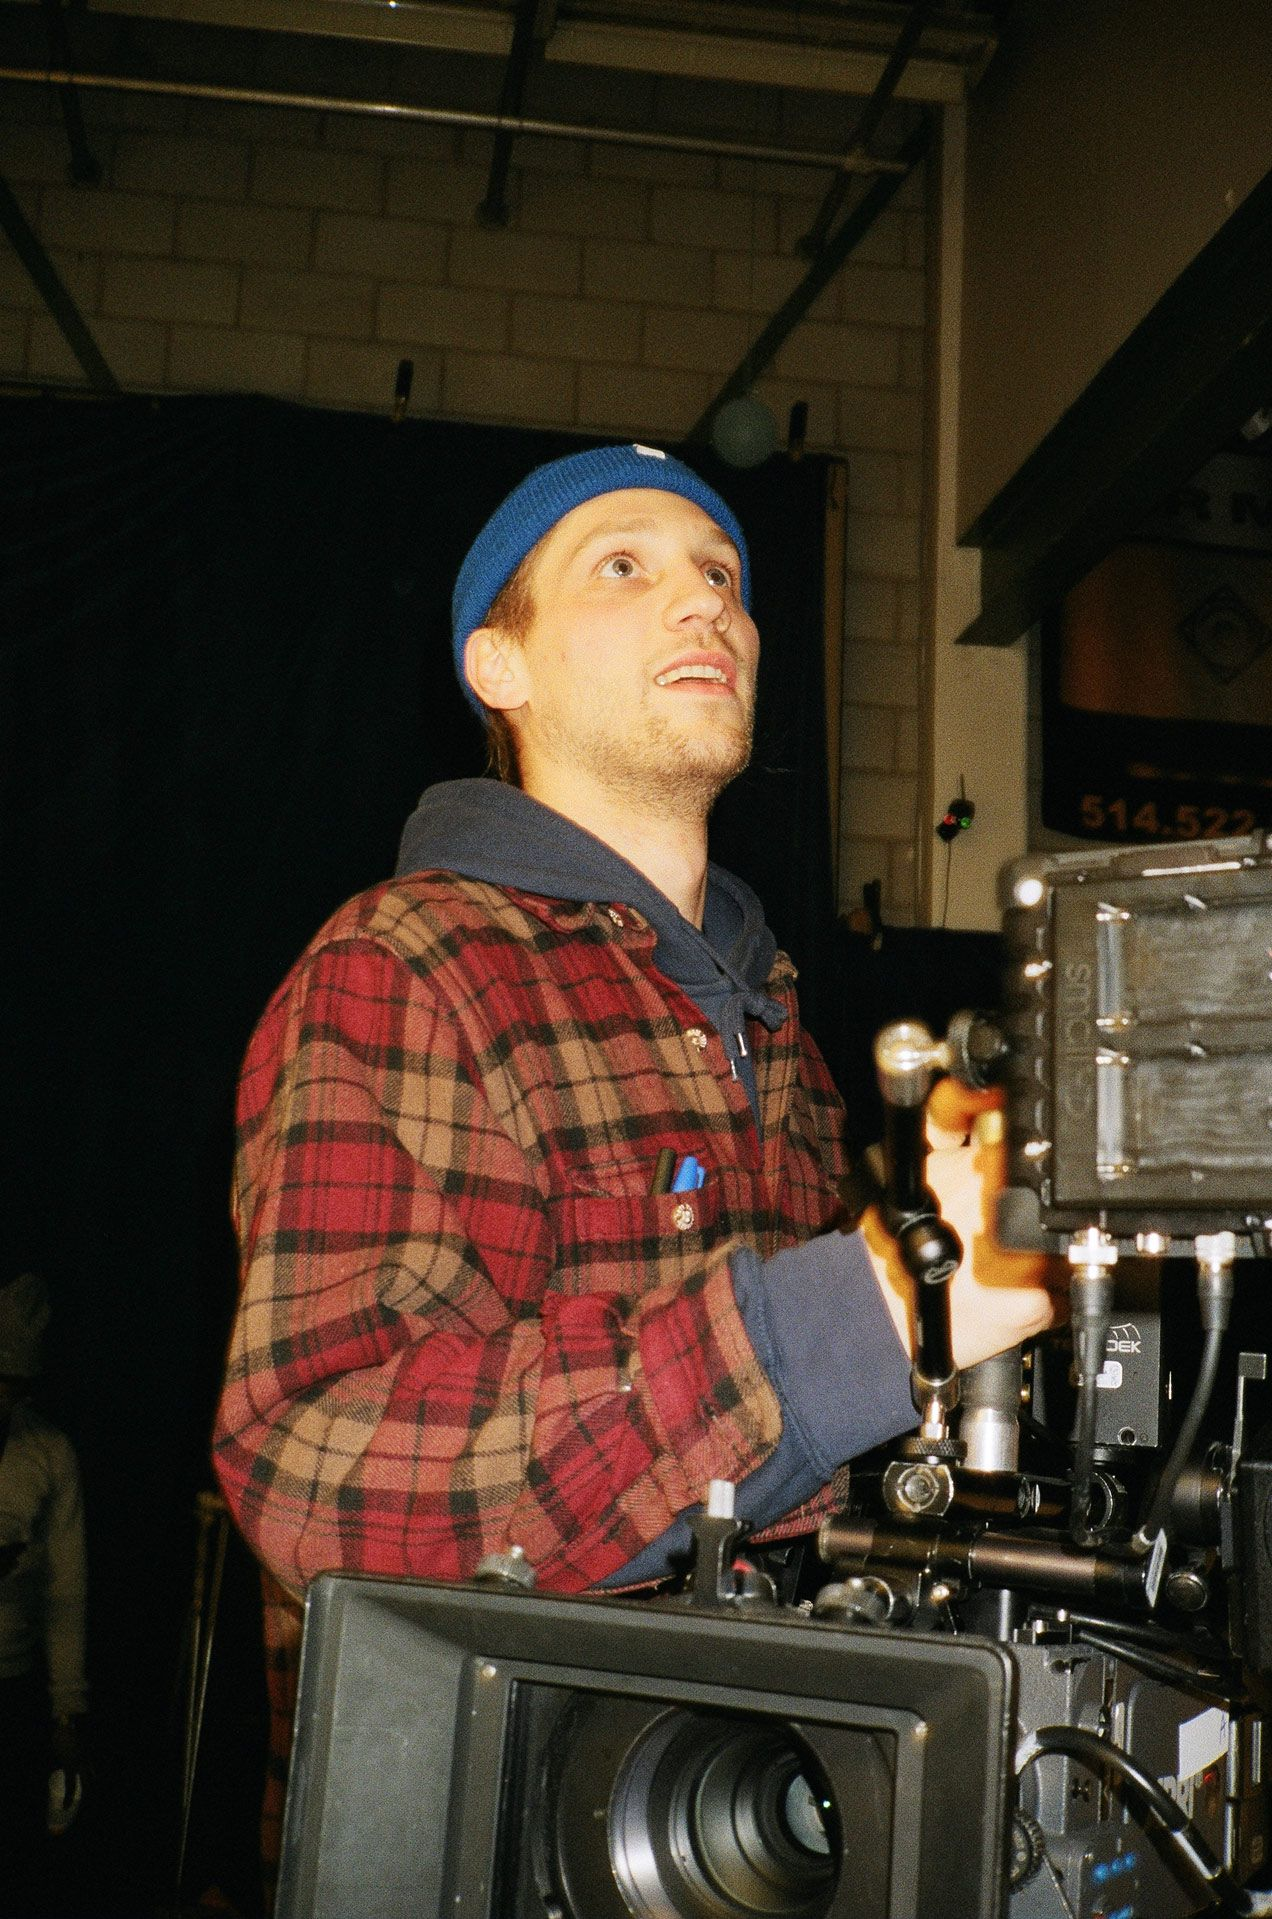 Christophe Sauvé filming rapper Zach Zoya music video Who Dat with Les Gamins